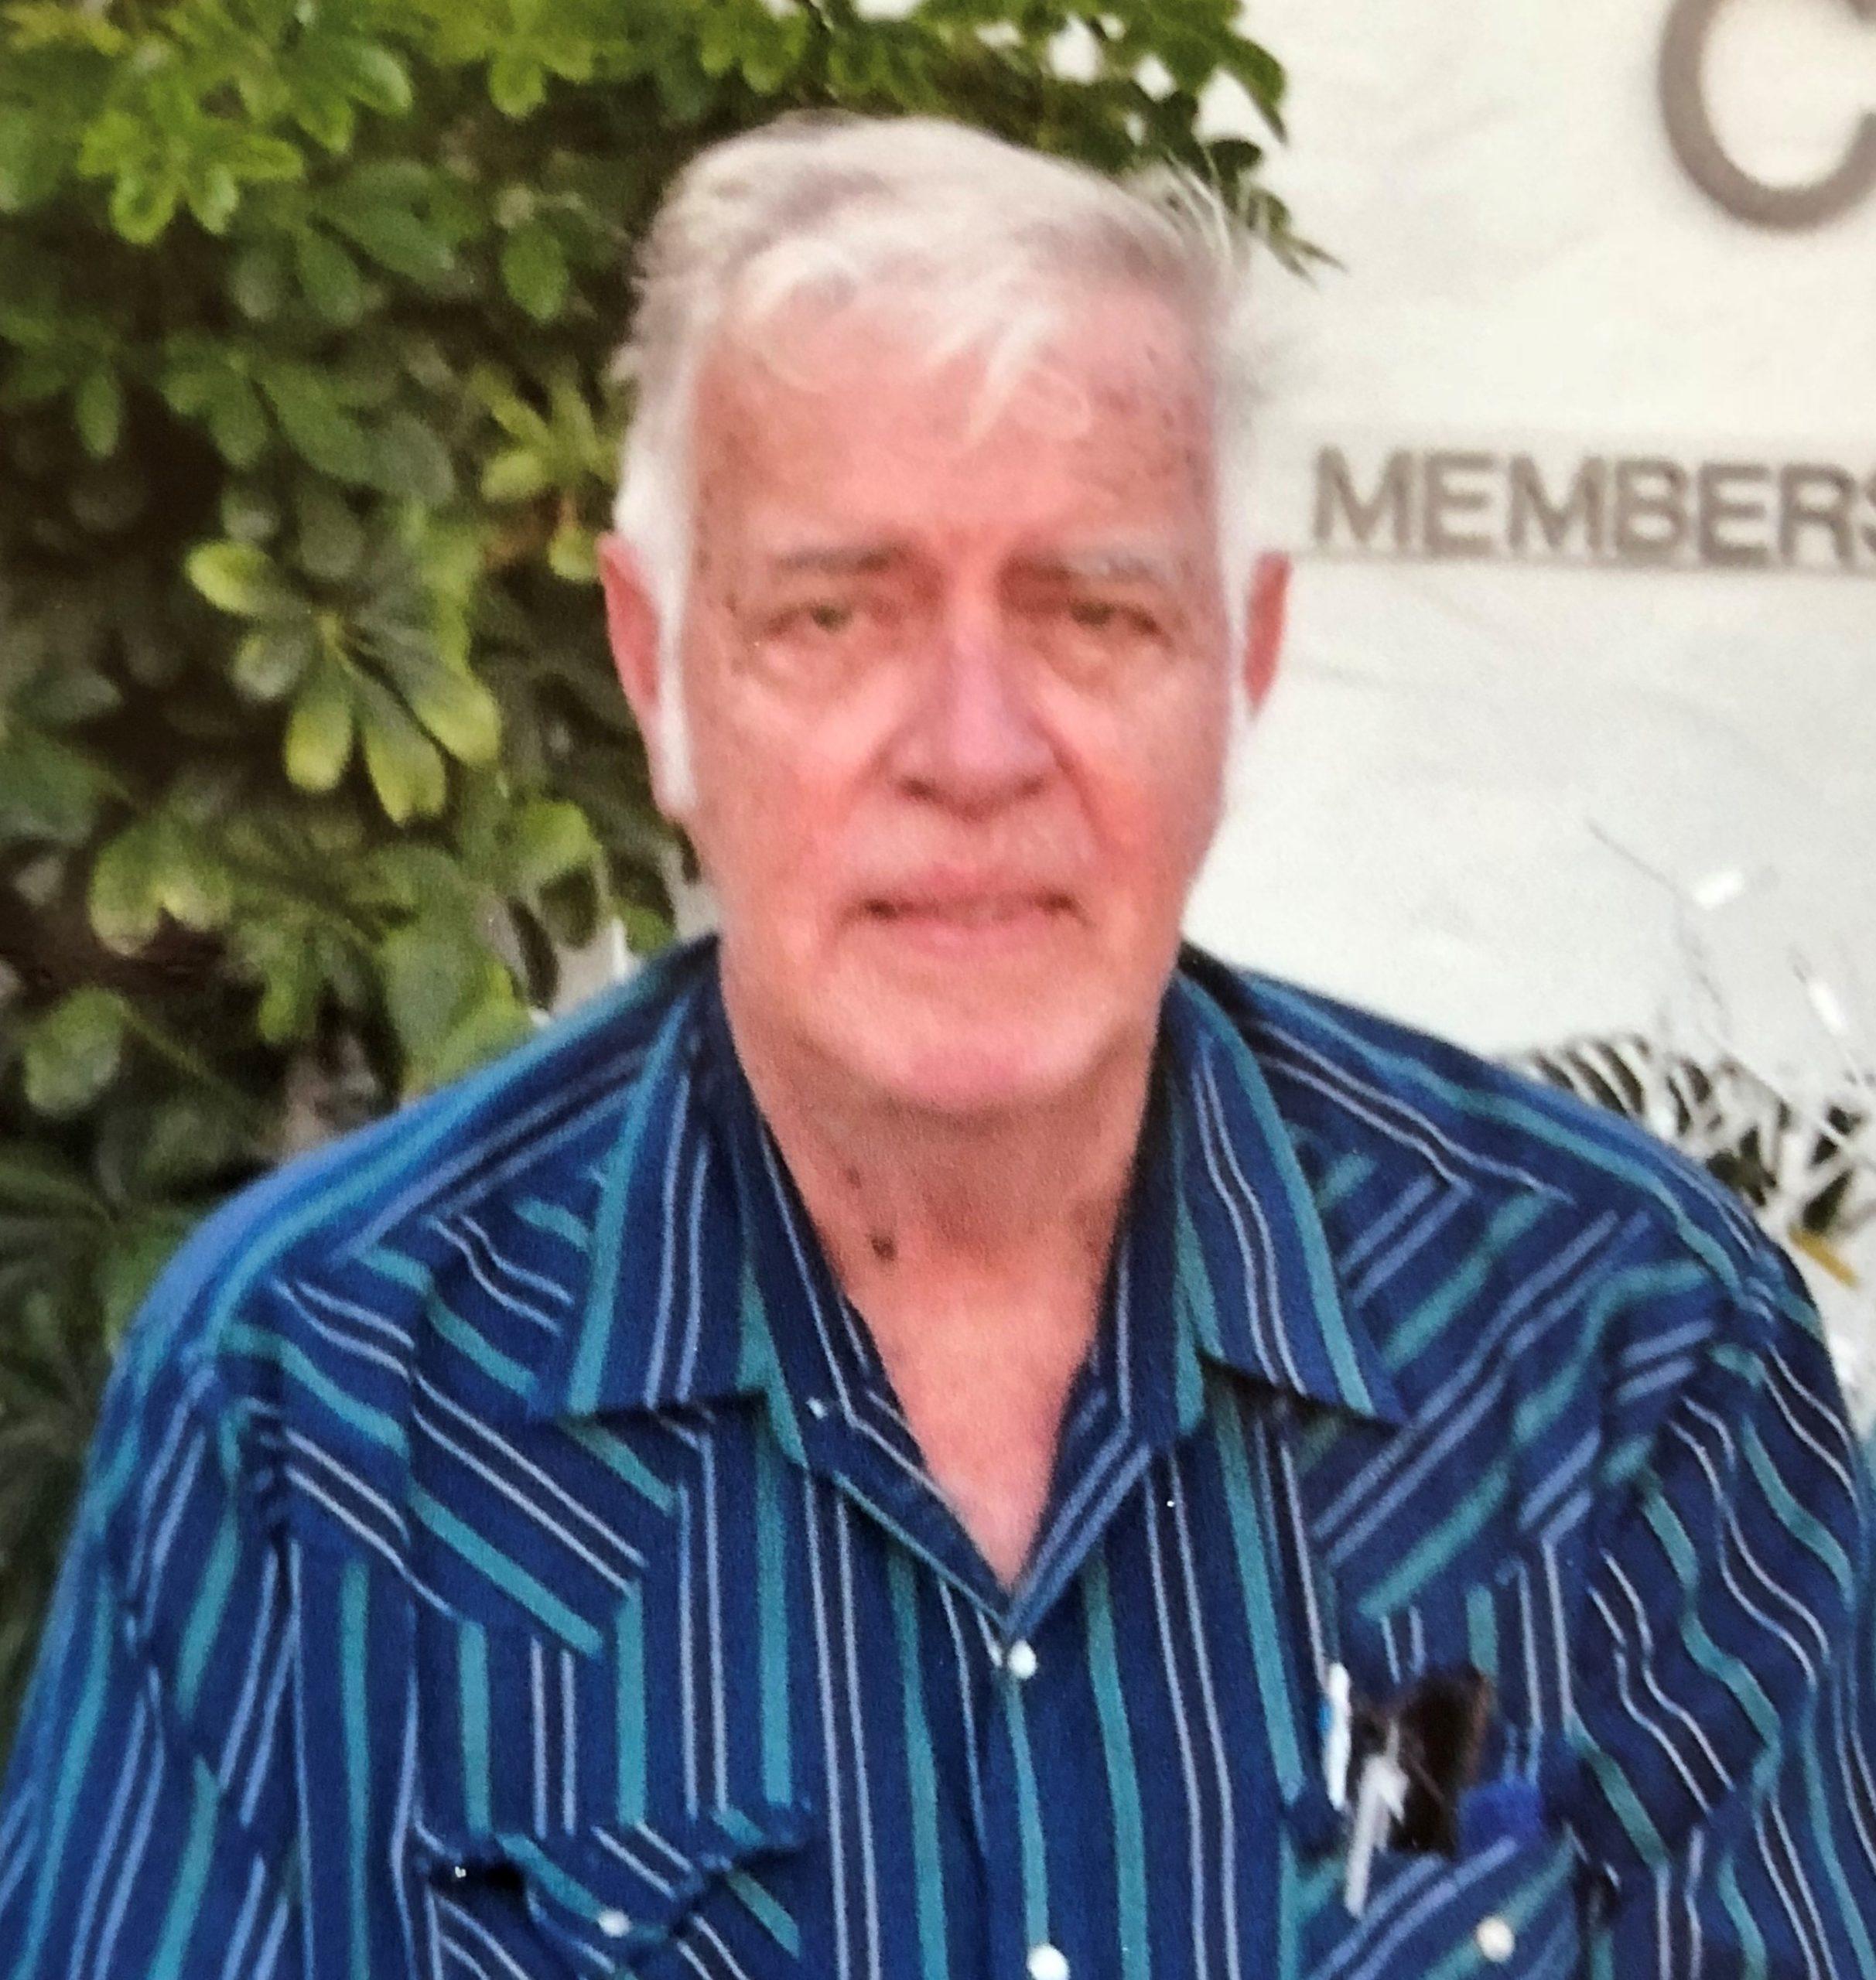 Benny O. Davidson